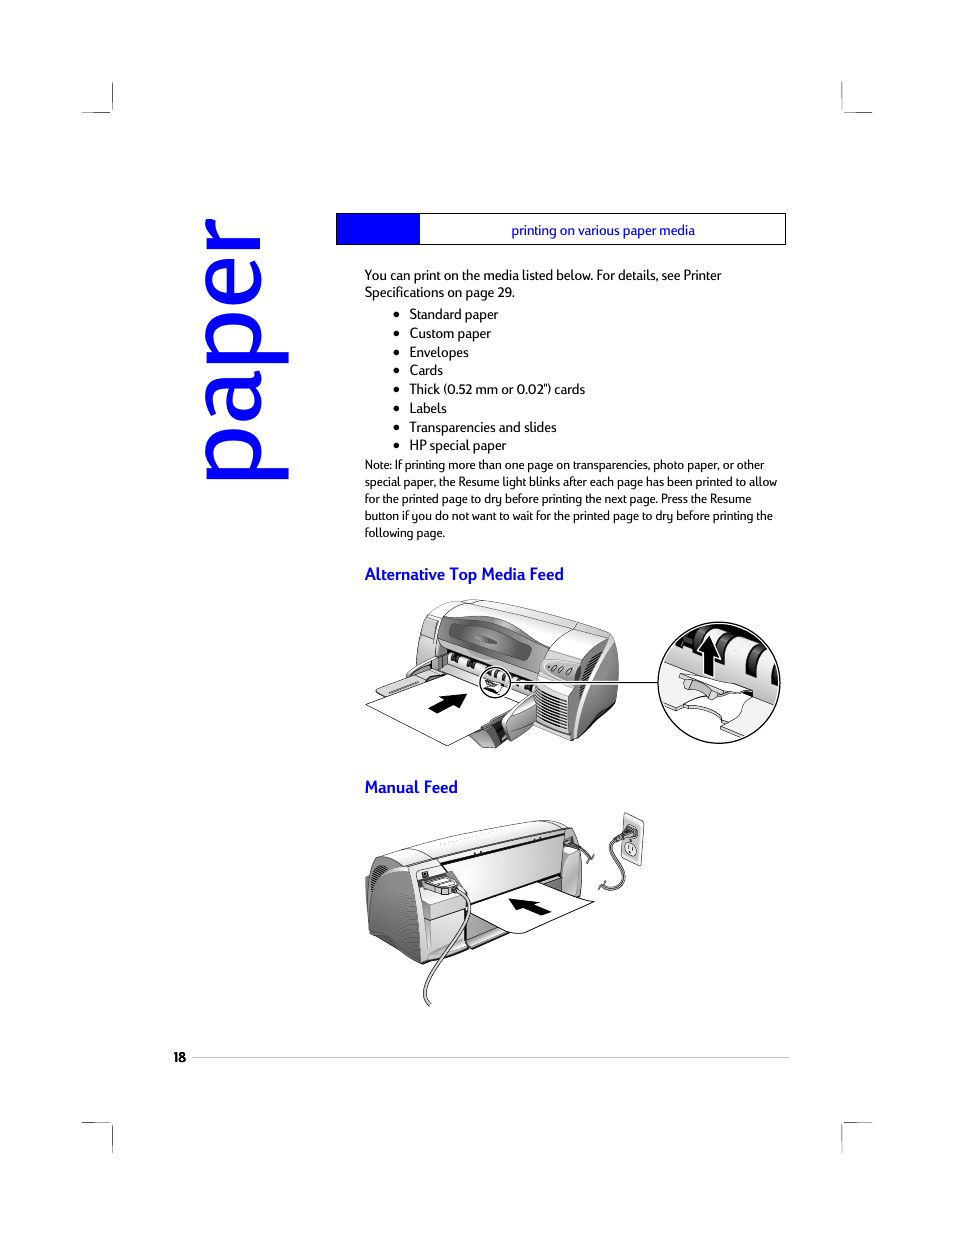 printing on various paper media  alternative top media